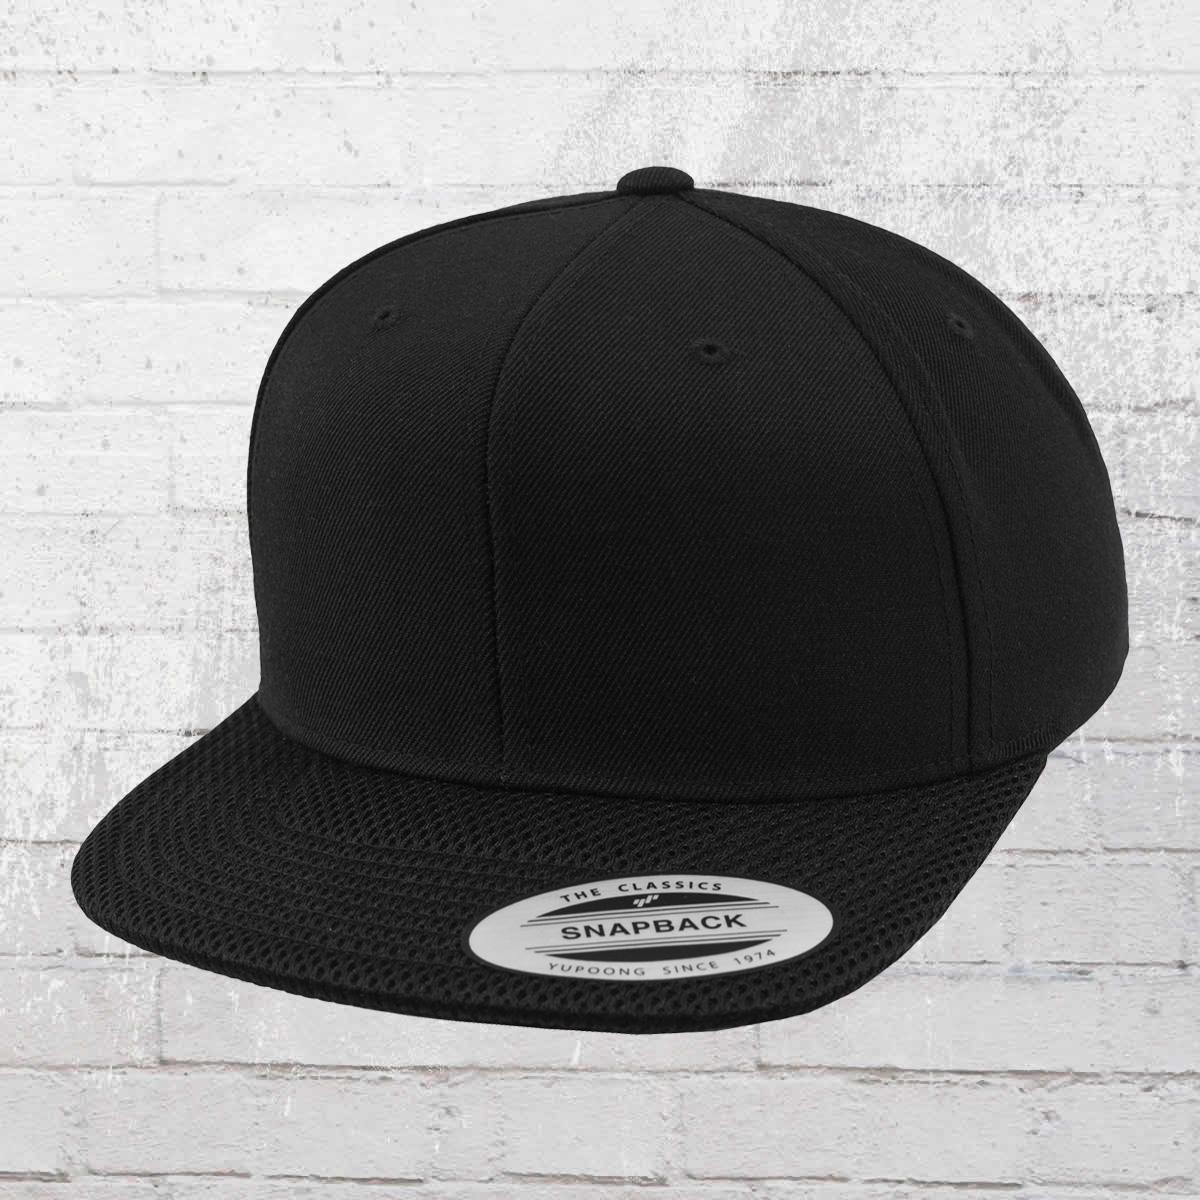 51e95aab0 Order now | Yupoong by Flexfit Mesh Visor Snapback Cap black